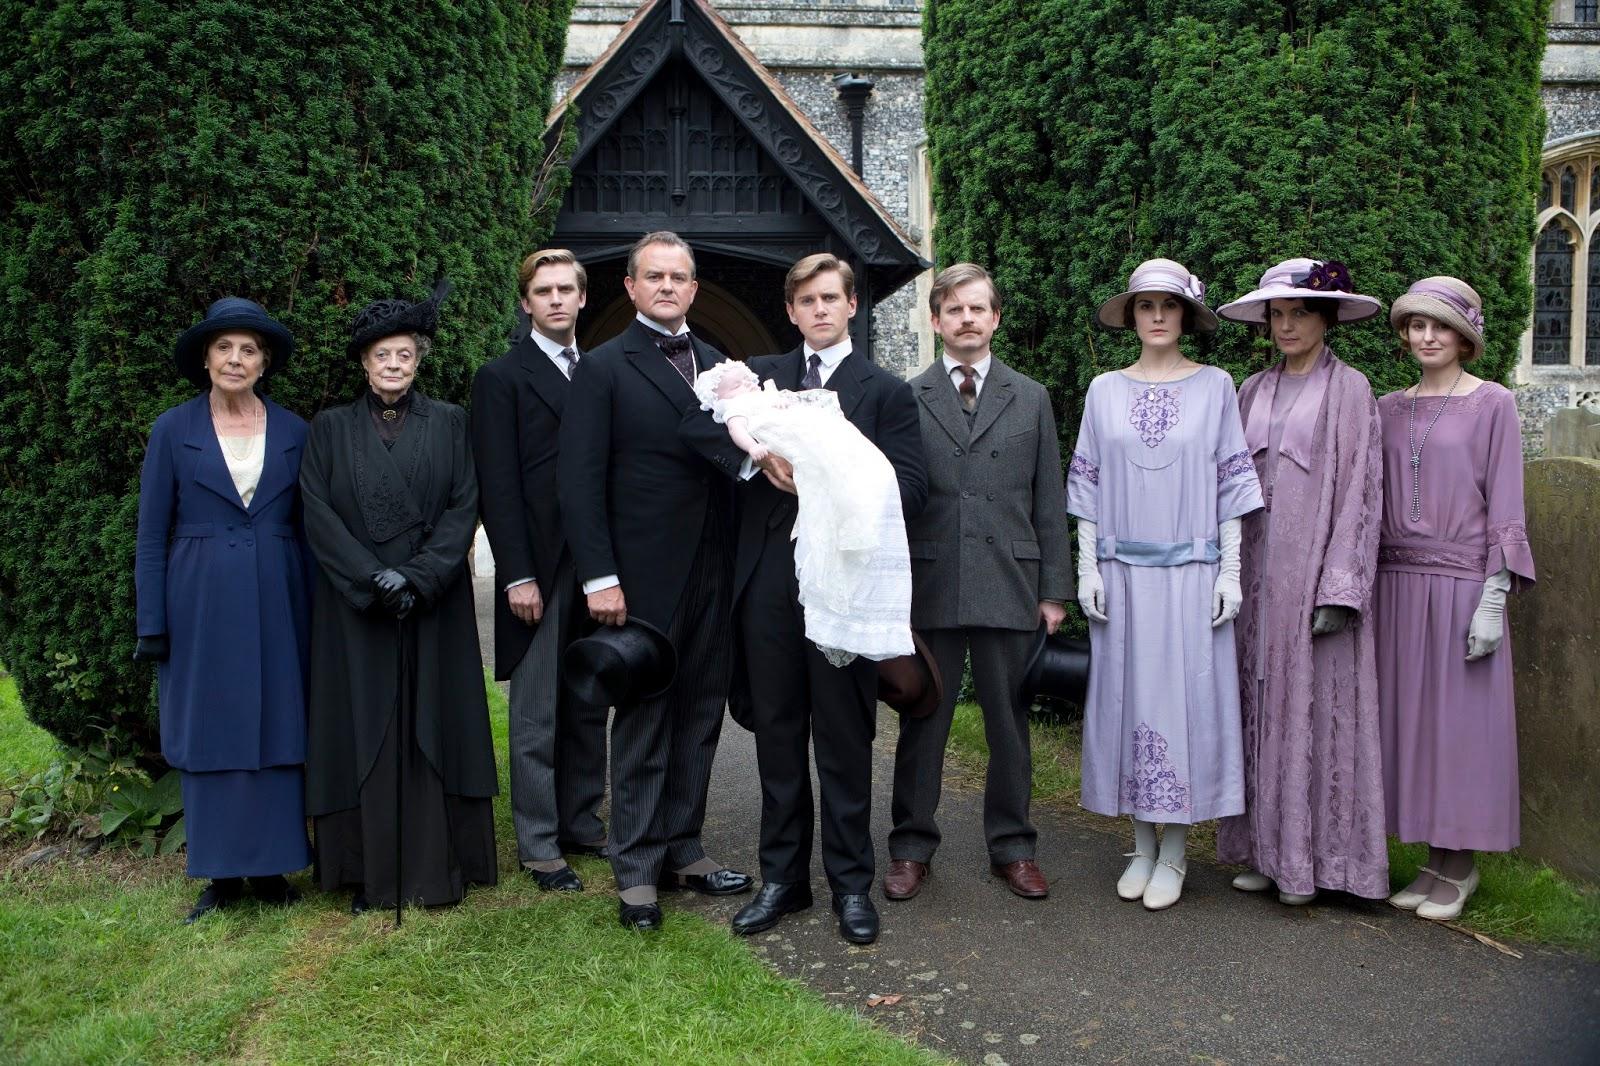 Downton abbey series 3 episode 8 online : Third star full movie